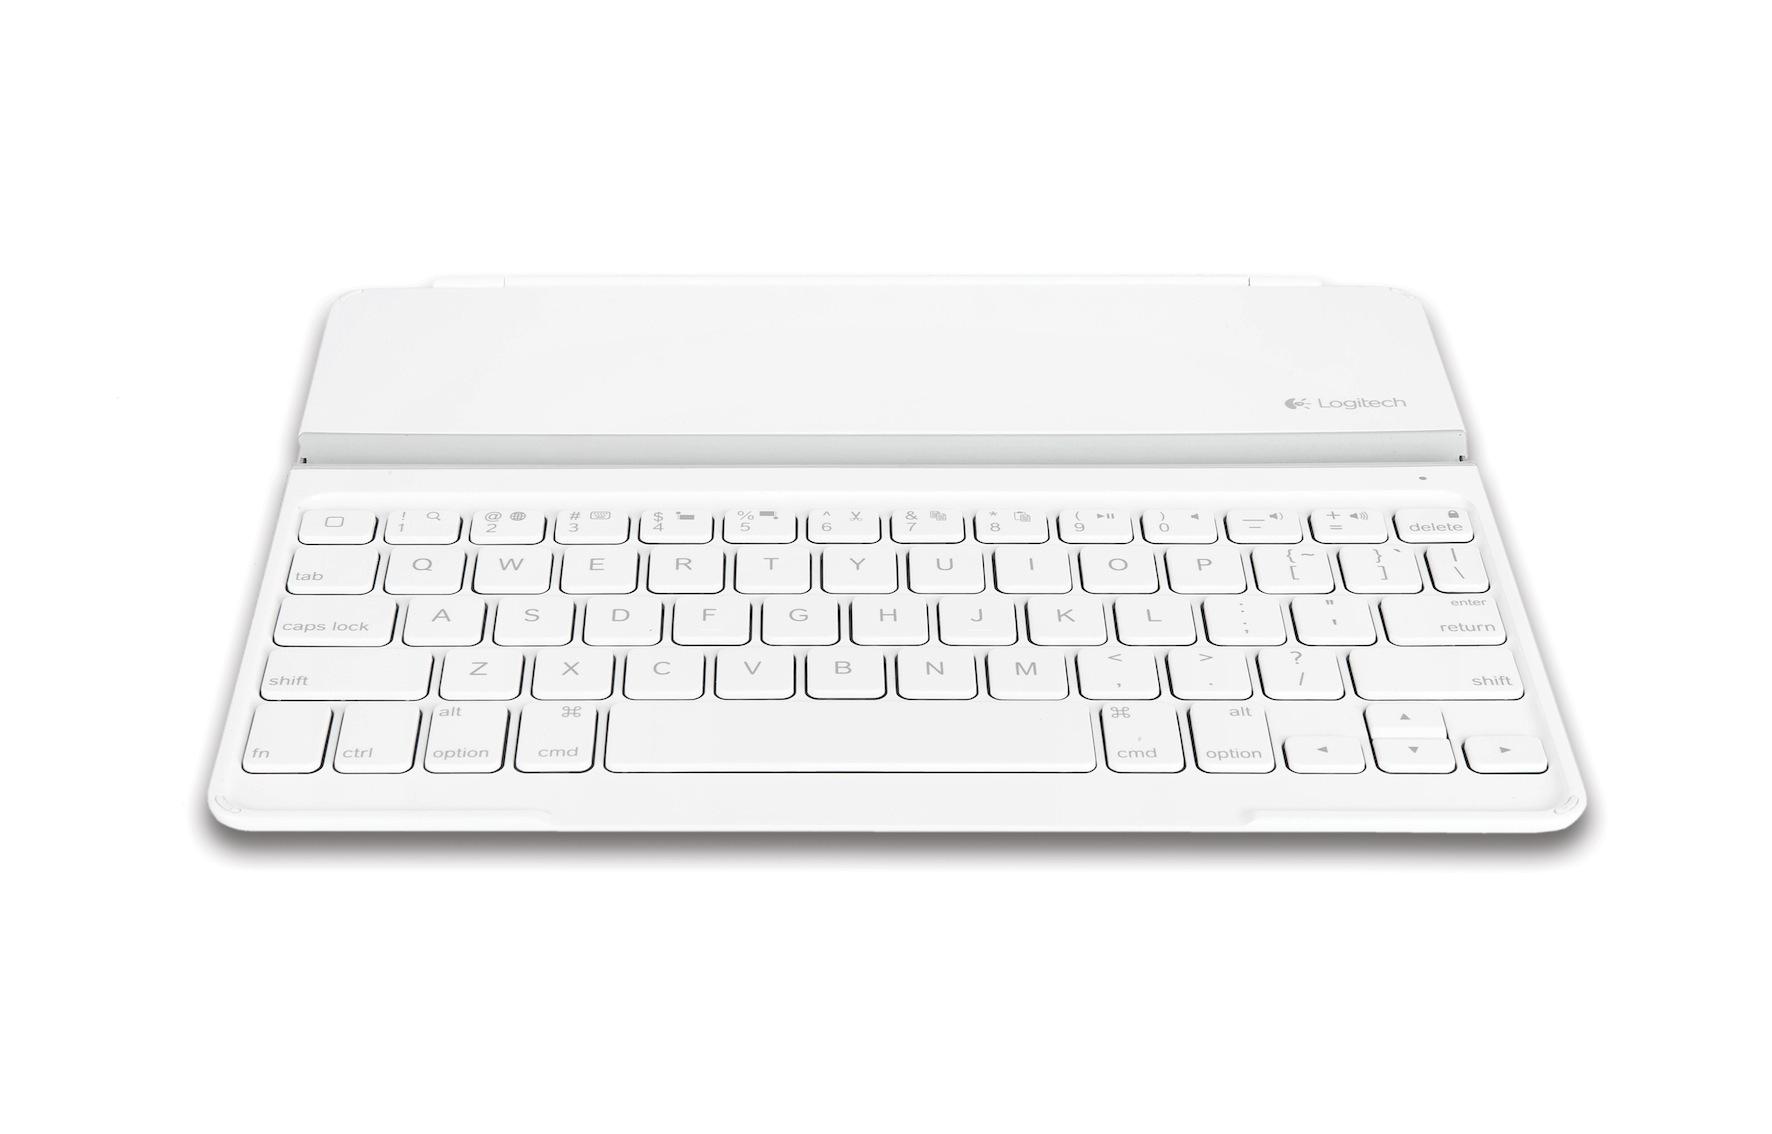 LOGITECH Ultrathin Keyboard Cover White